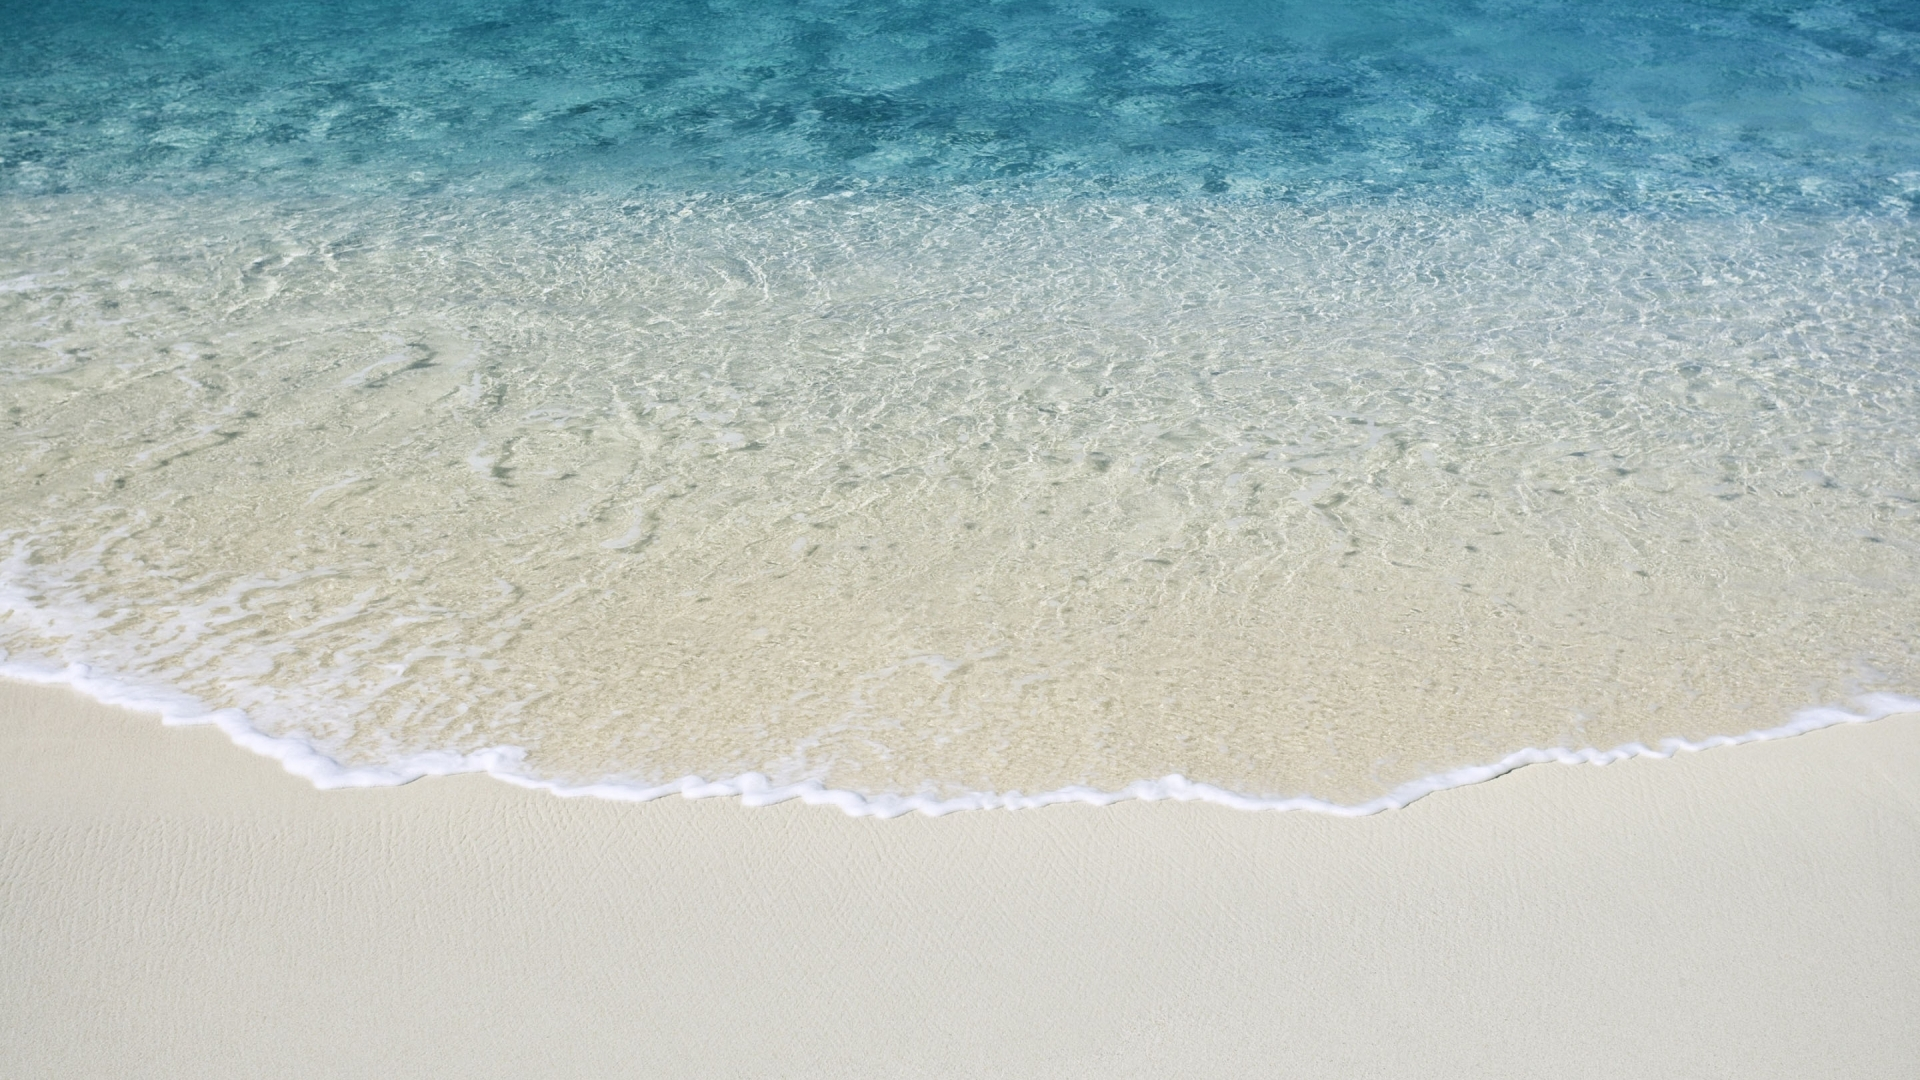 Shore Background 26579 1920x1200 px